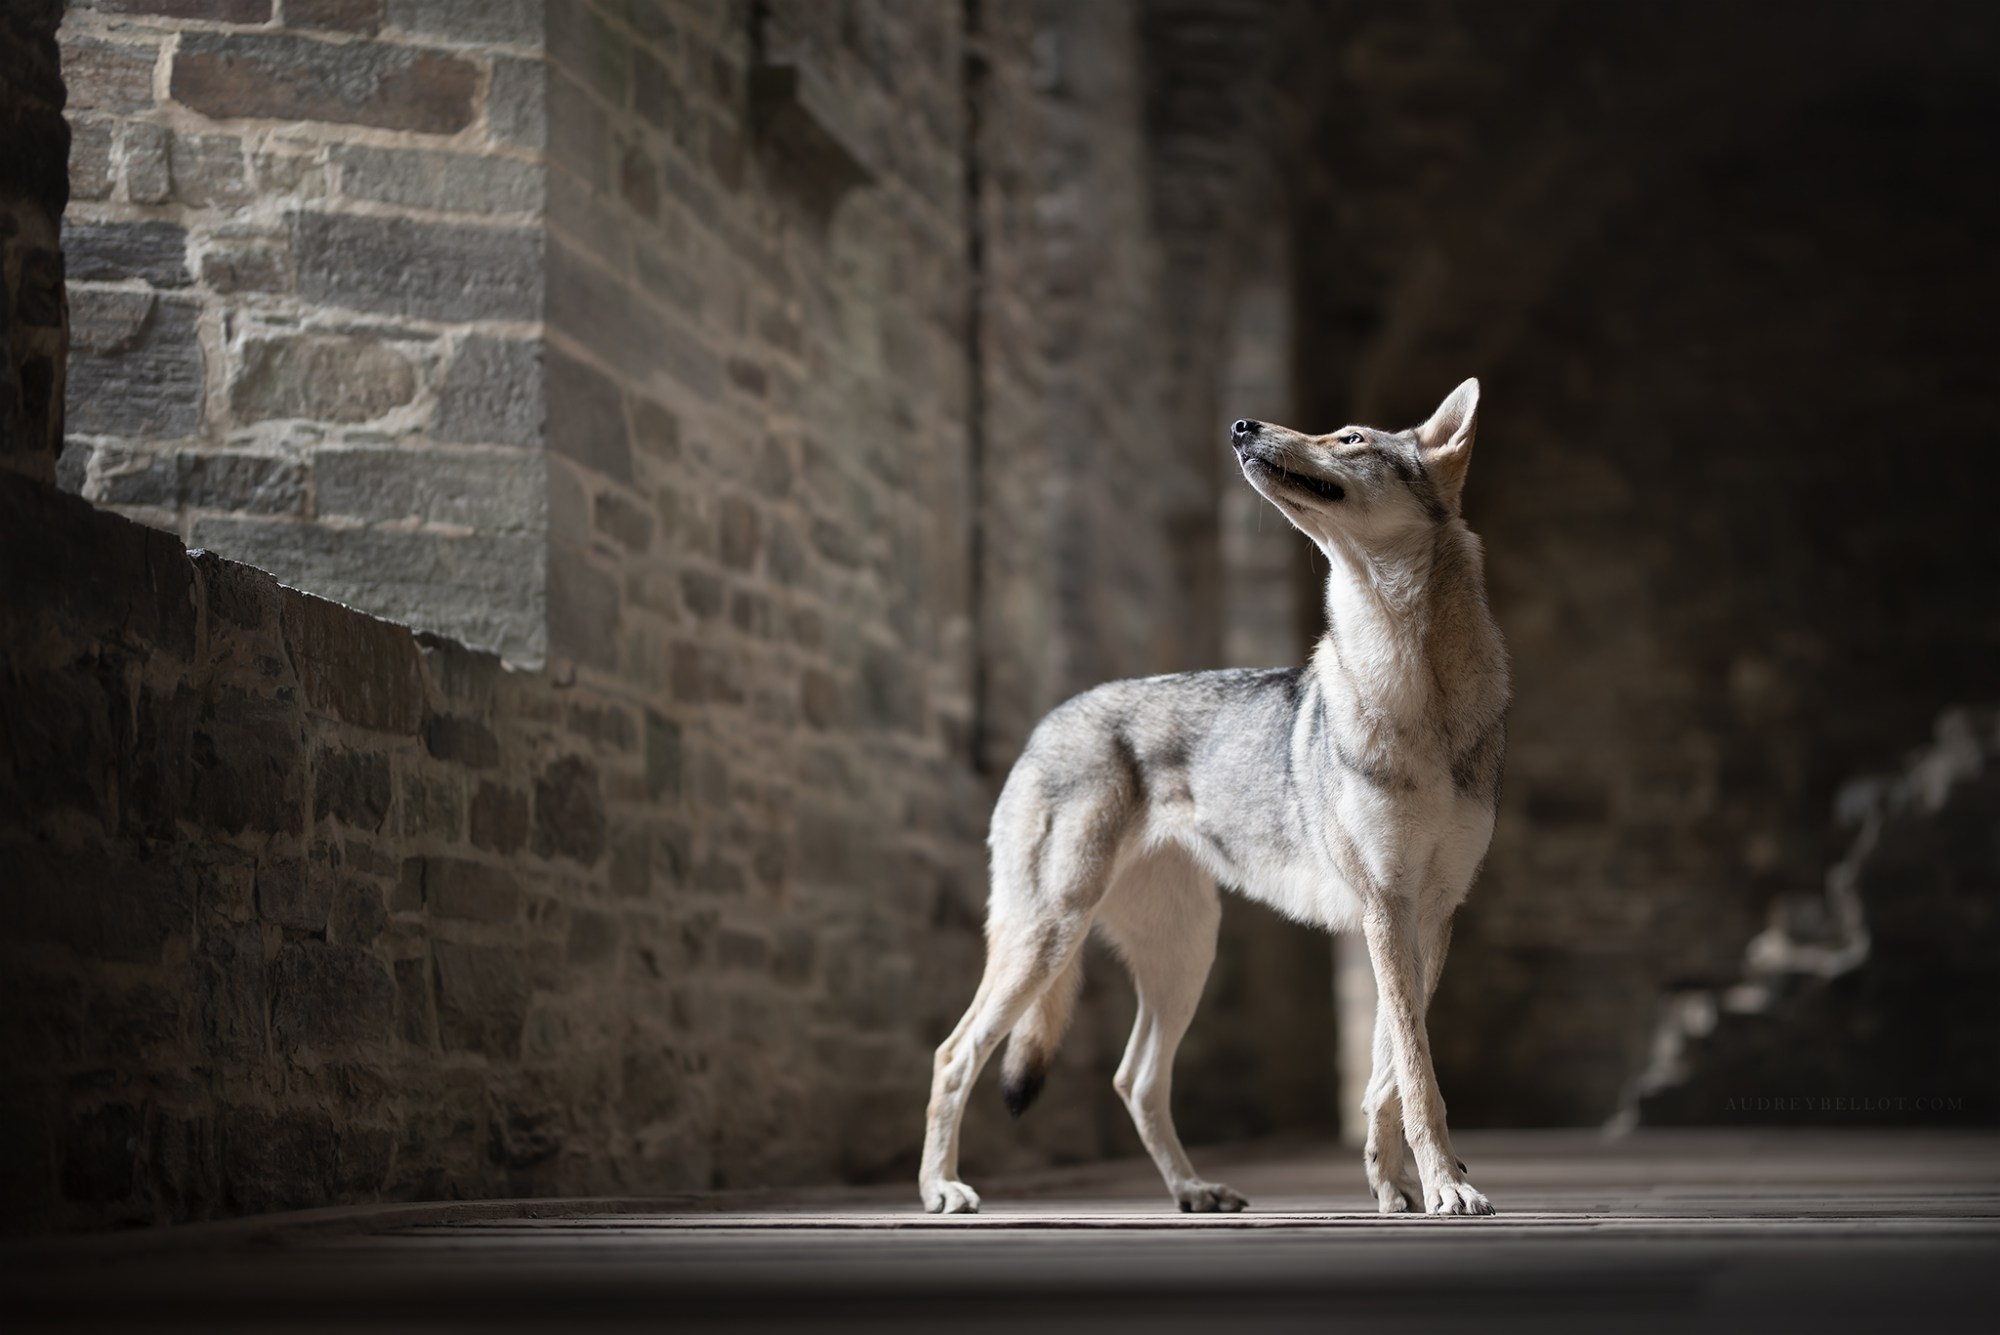 photographie canine photographe animalier artistique chiens chien loup de saarloos